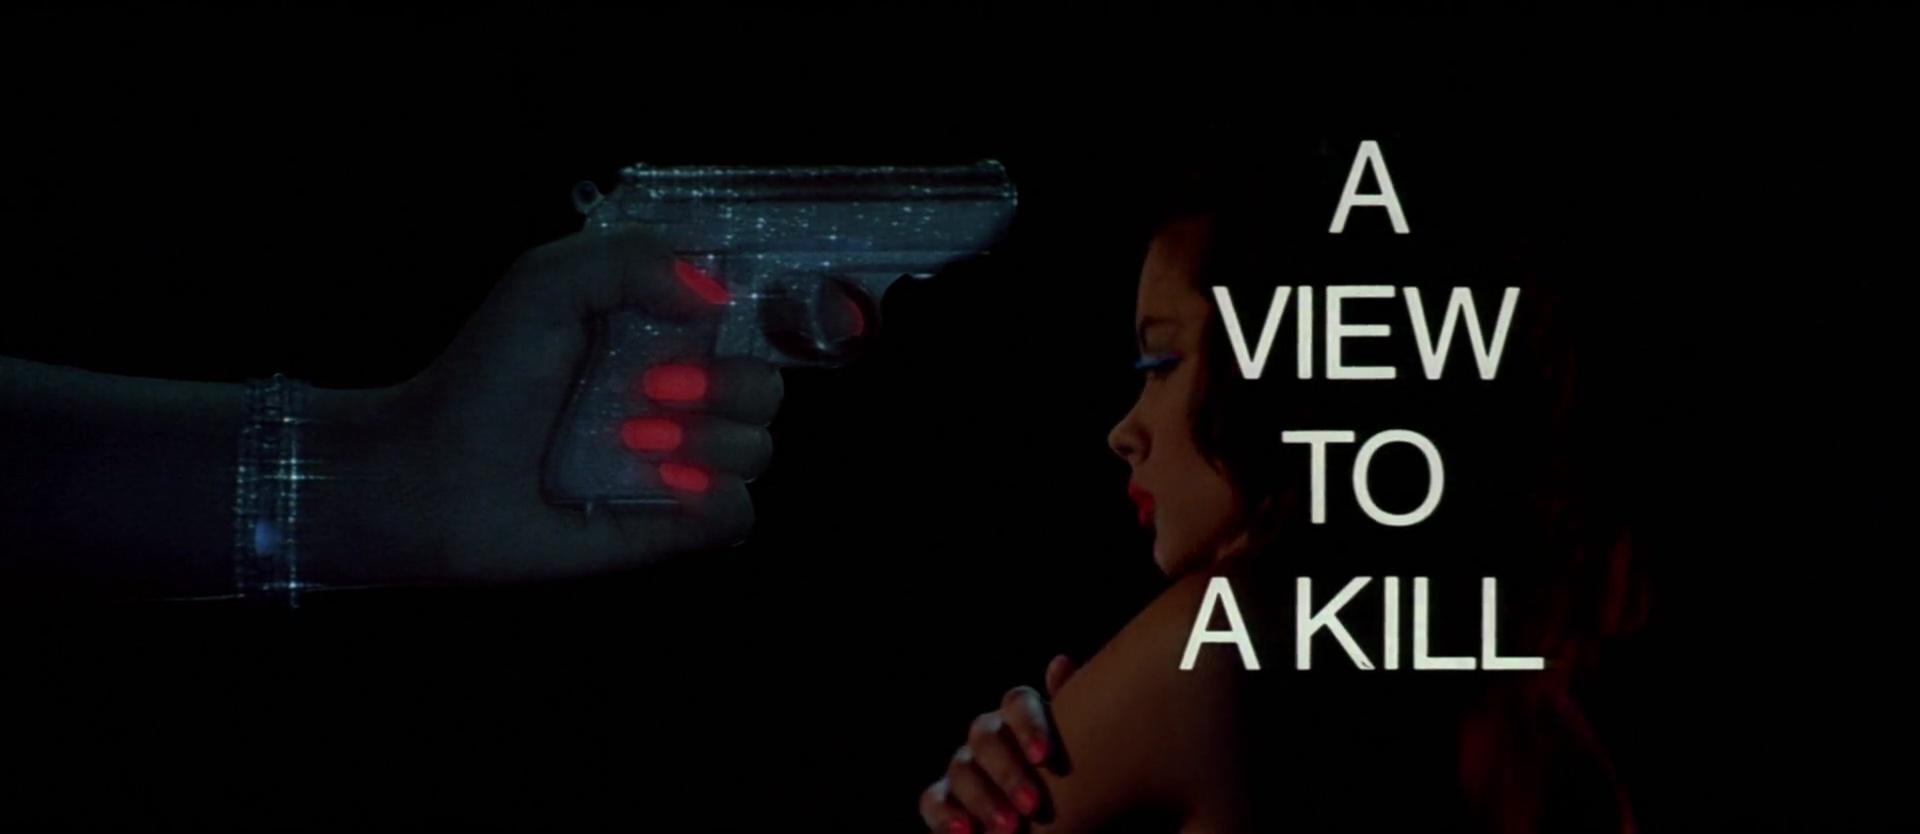 DANGEREUSEMENT VOTRE (A View to a Kill) de John Glen (1985)